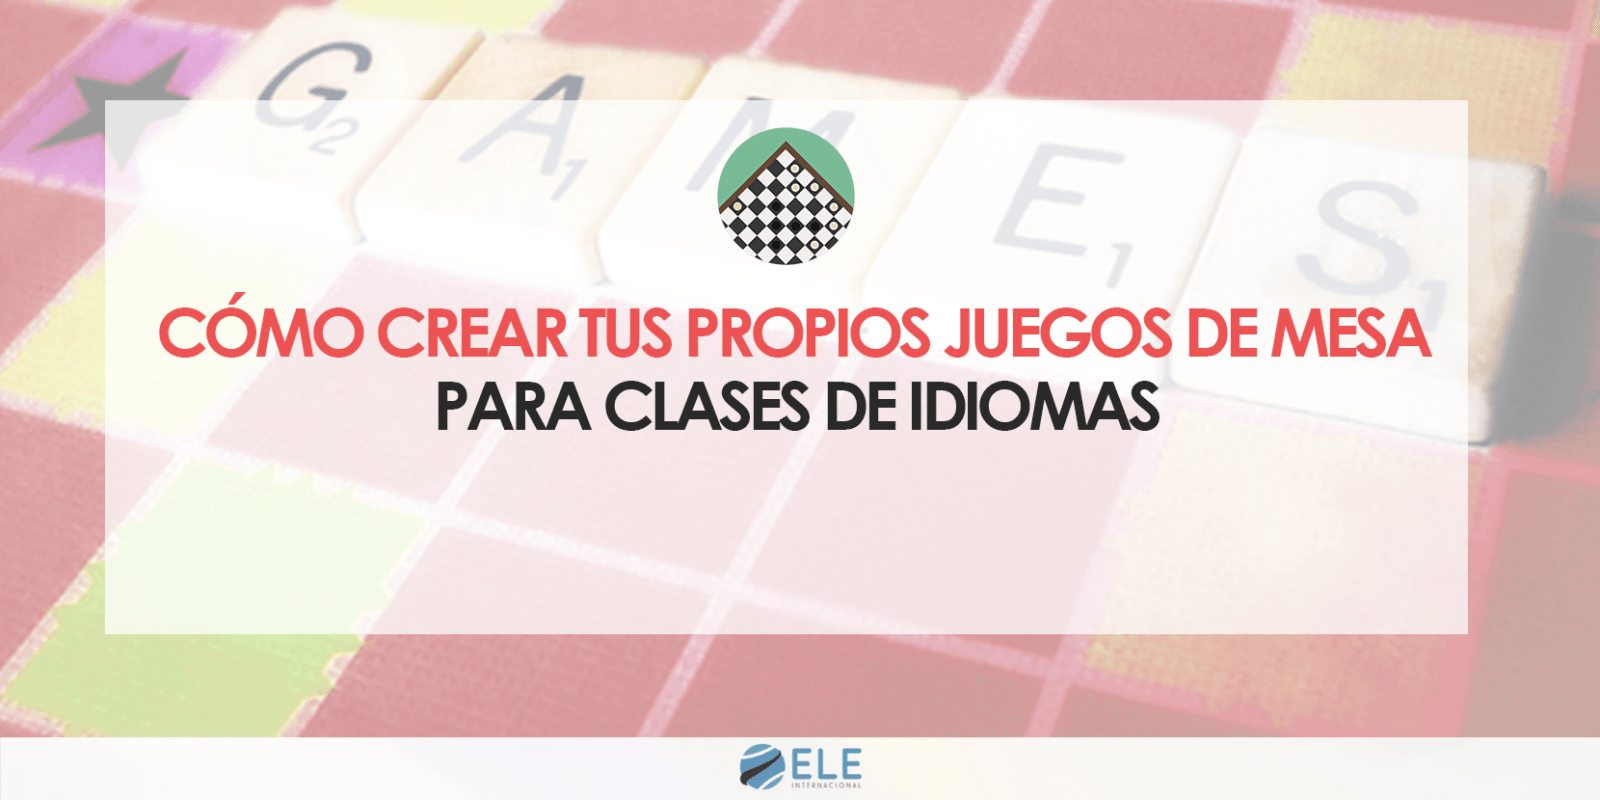 Juegos de mesa en clase de idiomas materiales #spanishteacher #maestra